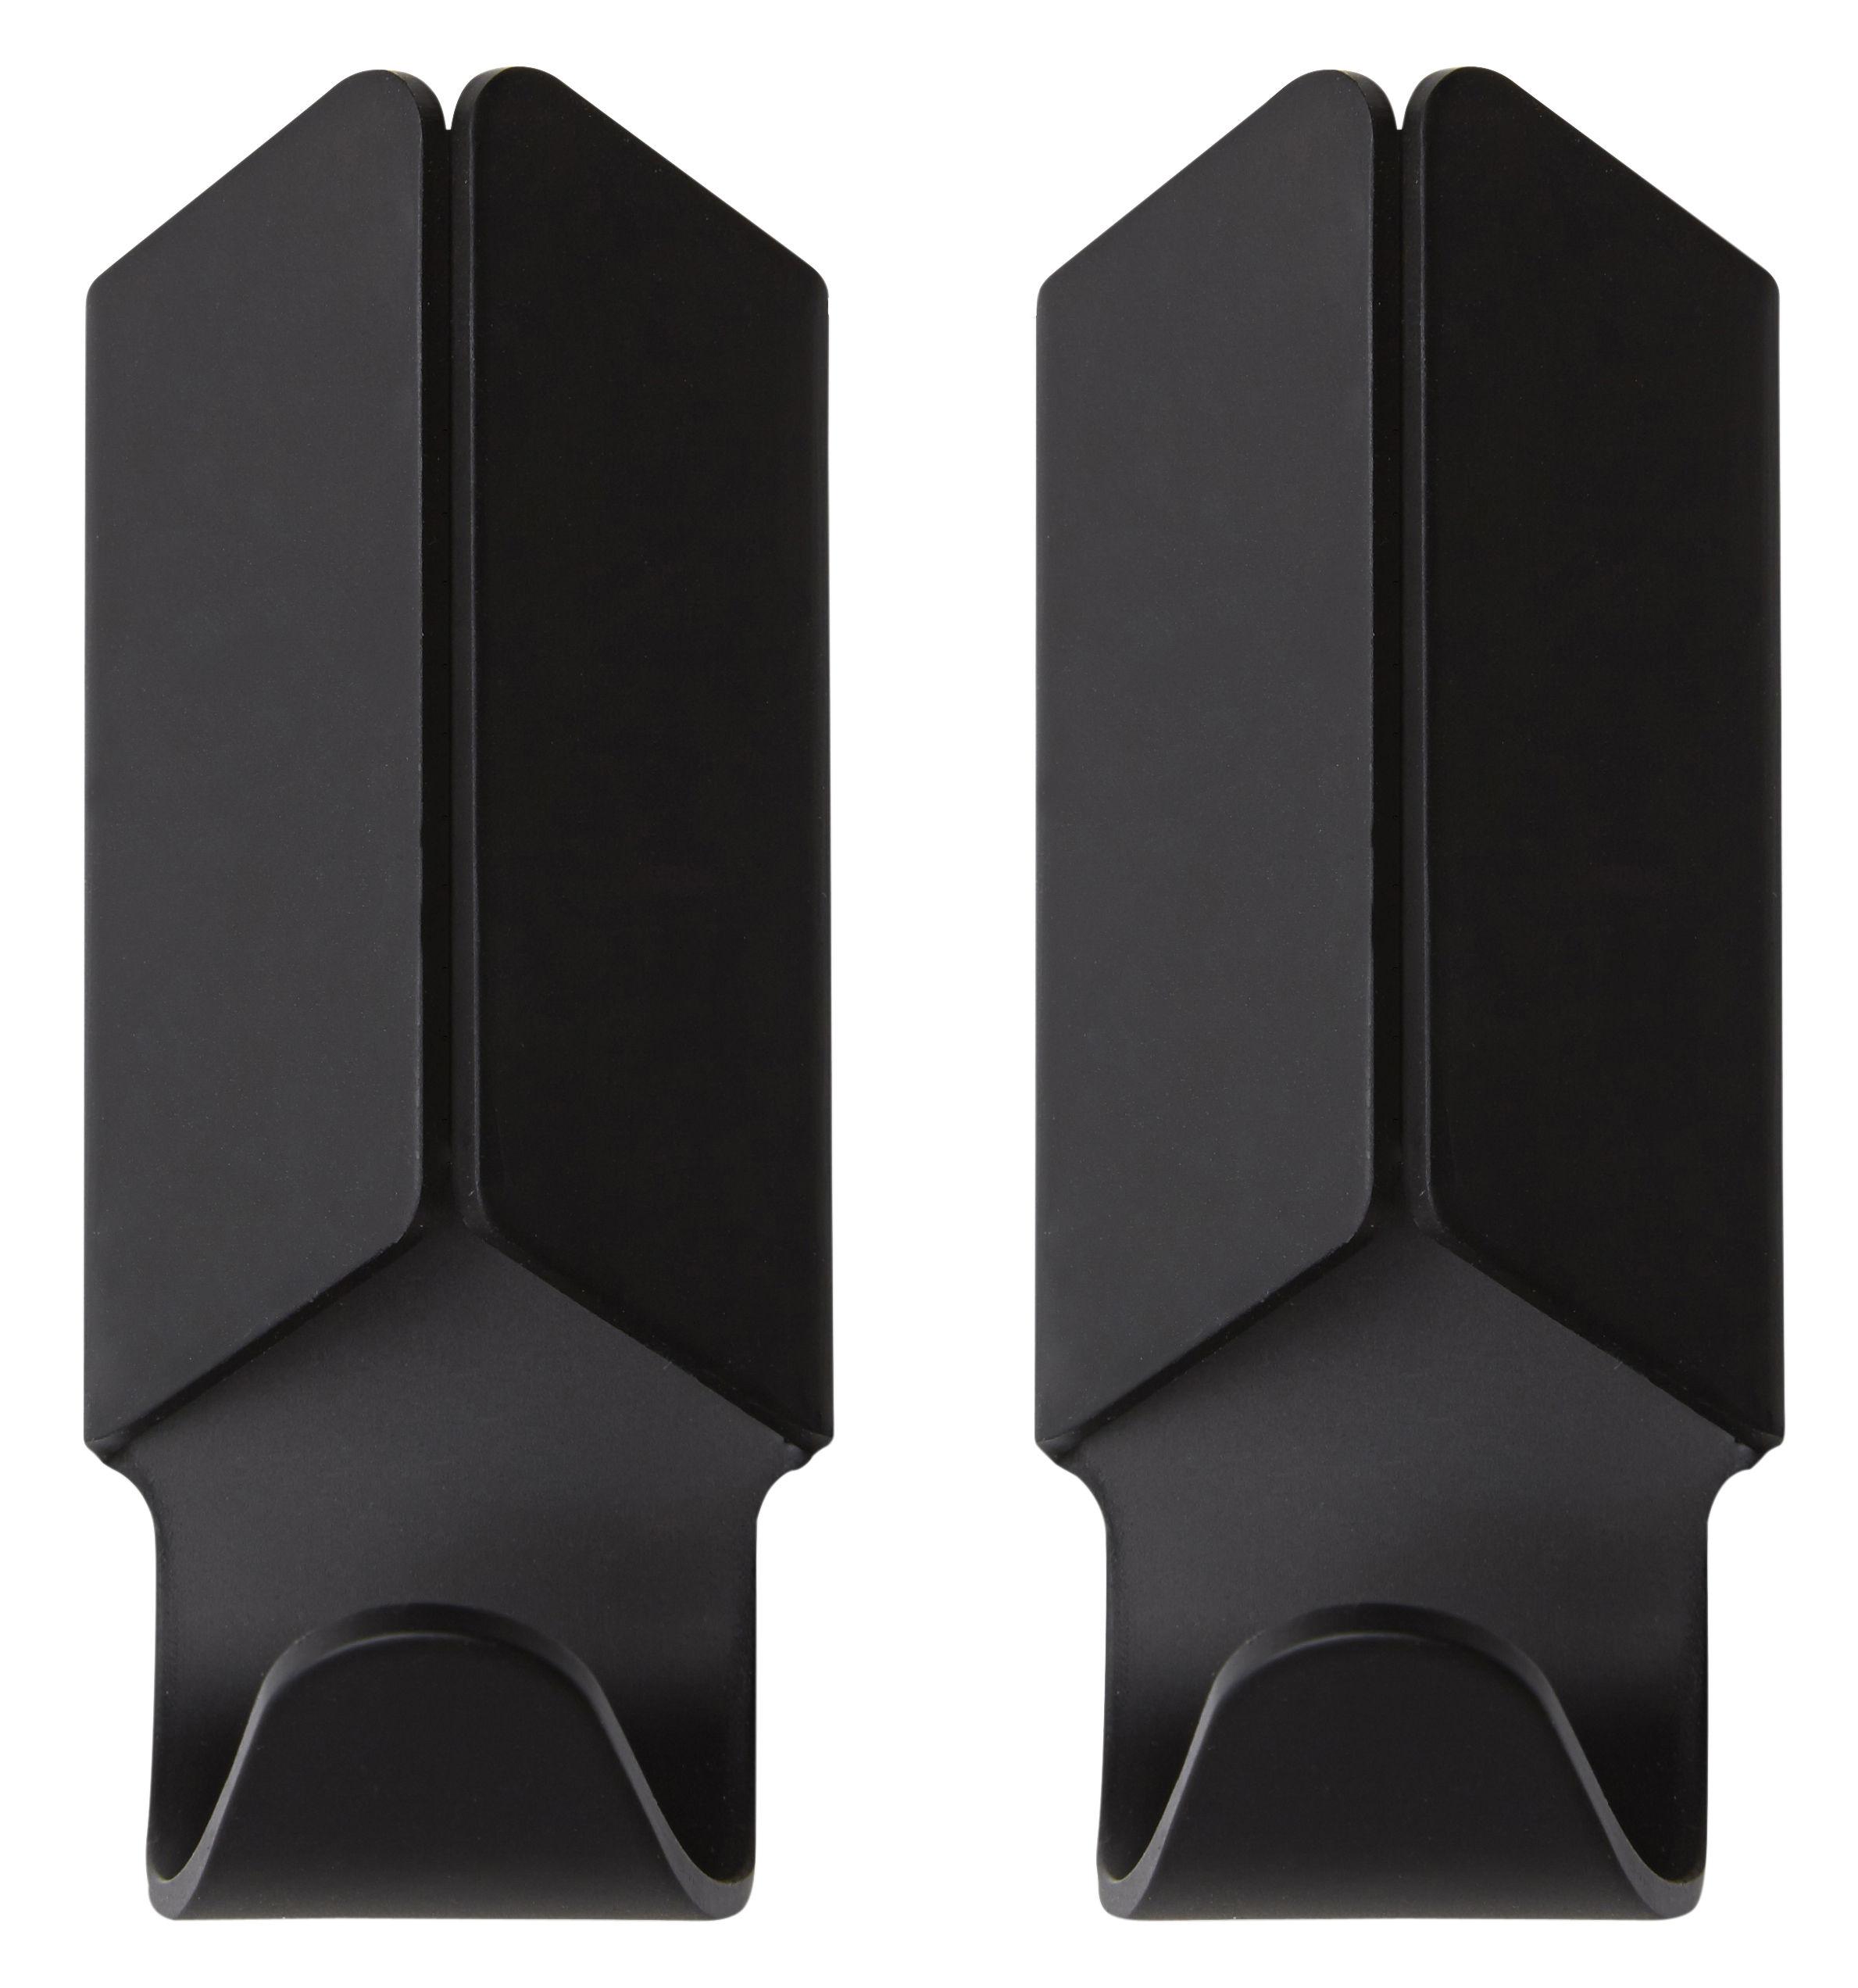 Furniture - Coat Racks & Pegs - Volet Hook - Set of 2 by Hay - Black - Anodized aluminium